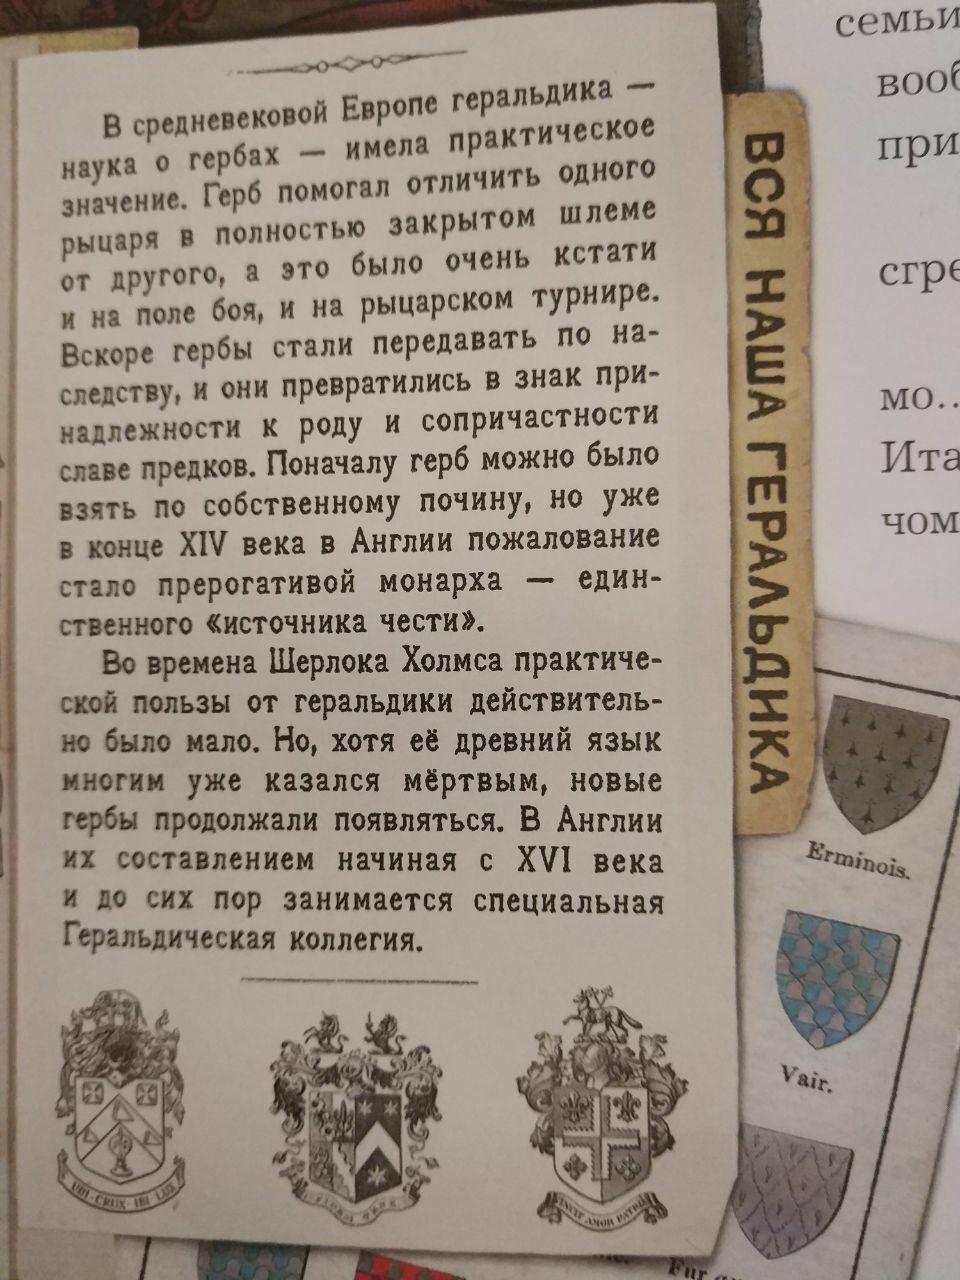 http://s3.uploads.ru/EWm6M.jpg